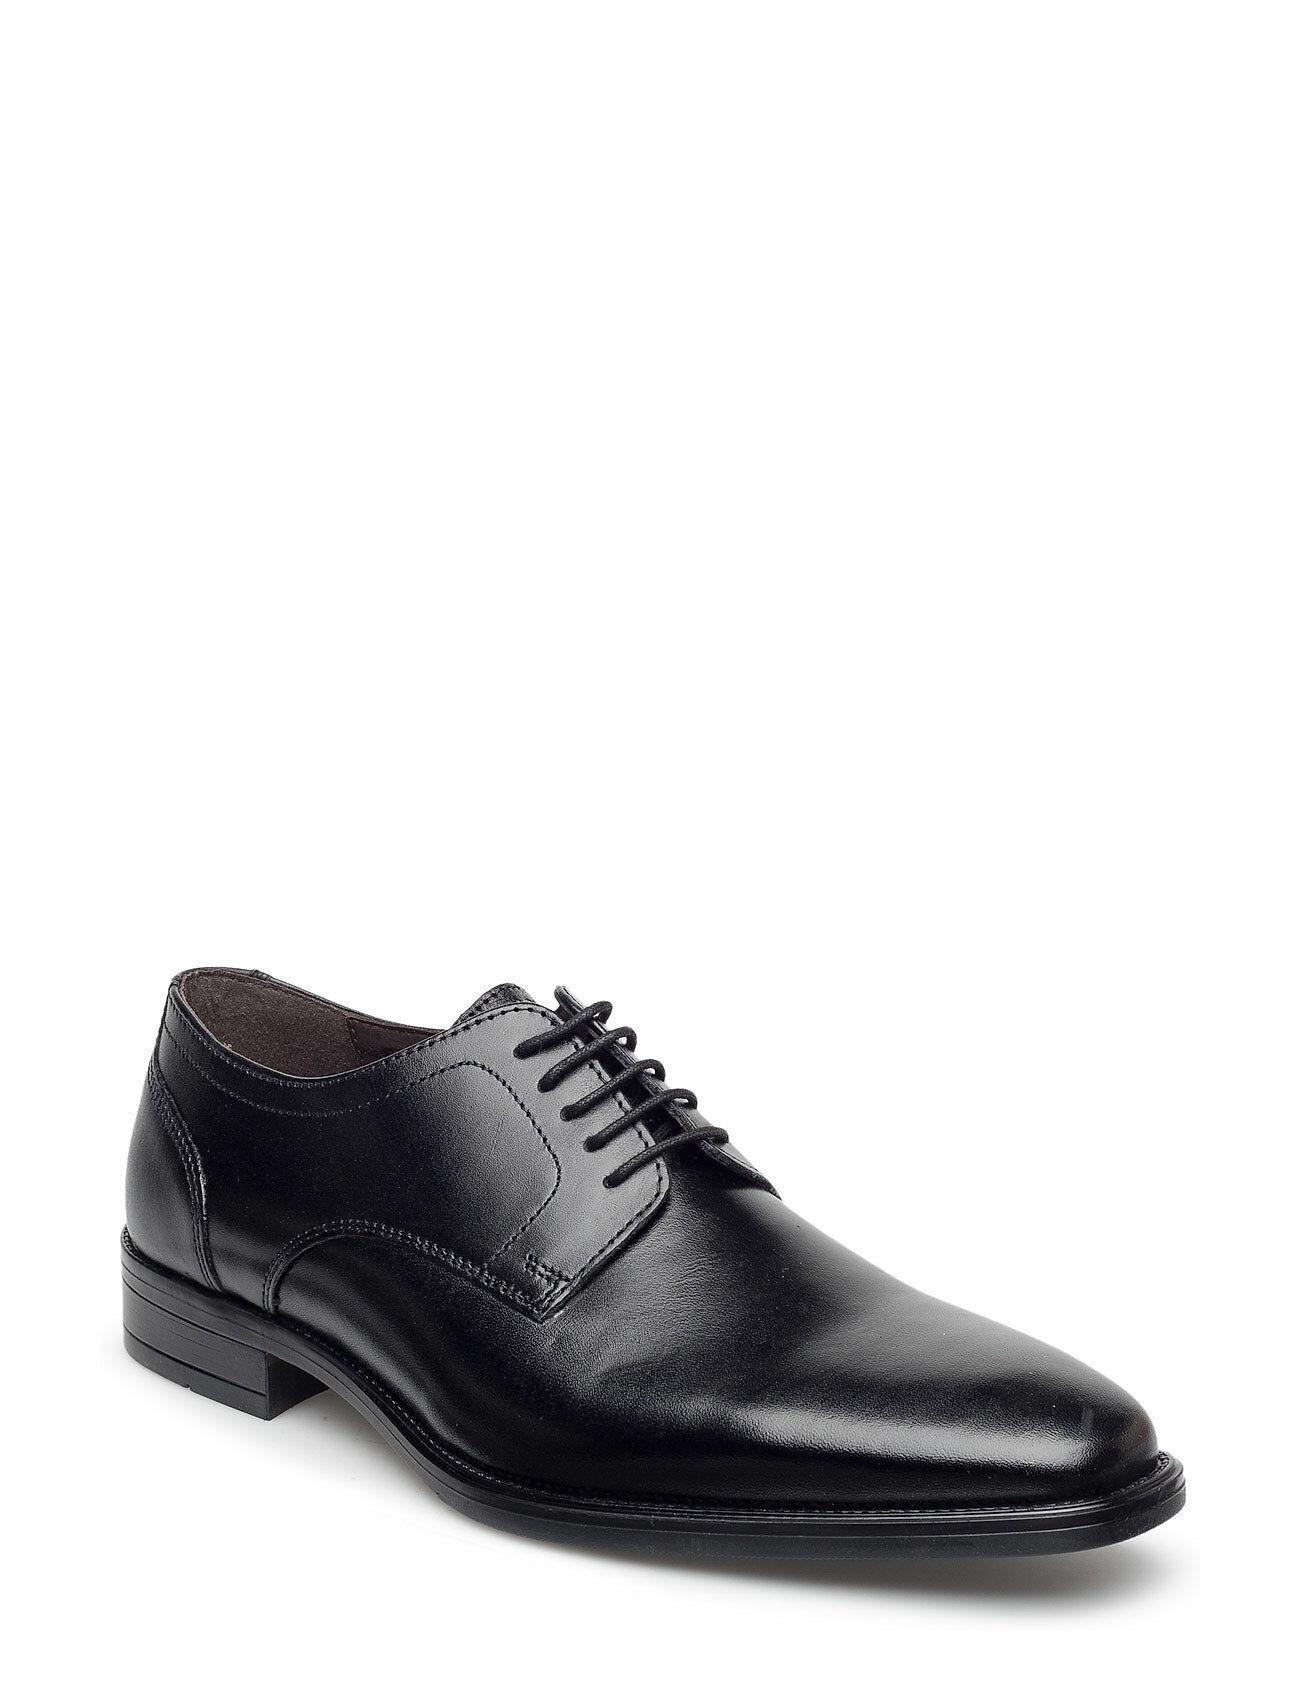 Playboy Footwear 6508 Shoes Business Laced Shoes Musta Playboy Footwear